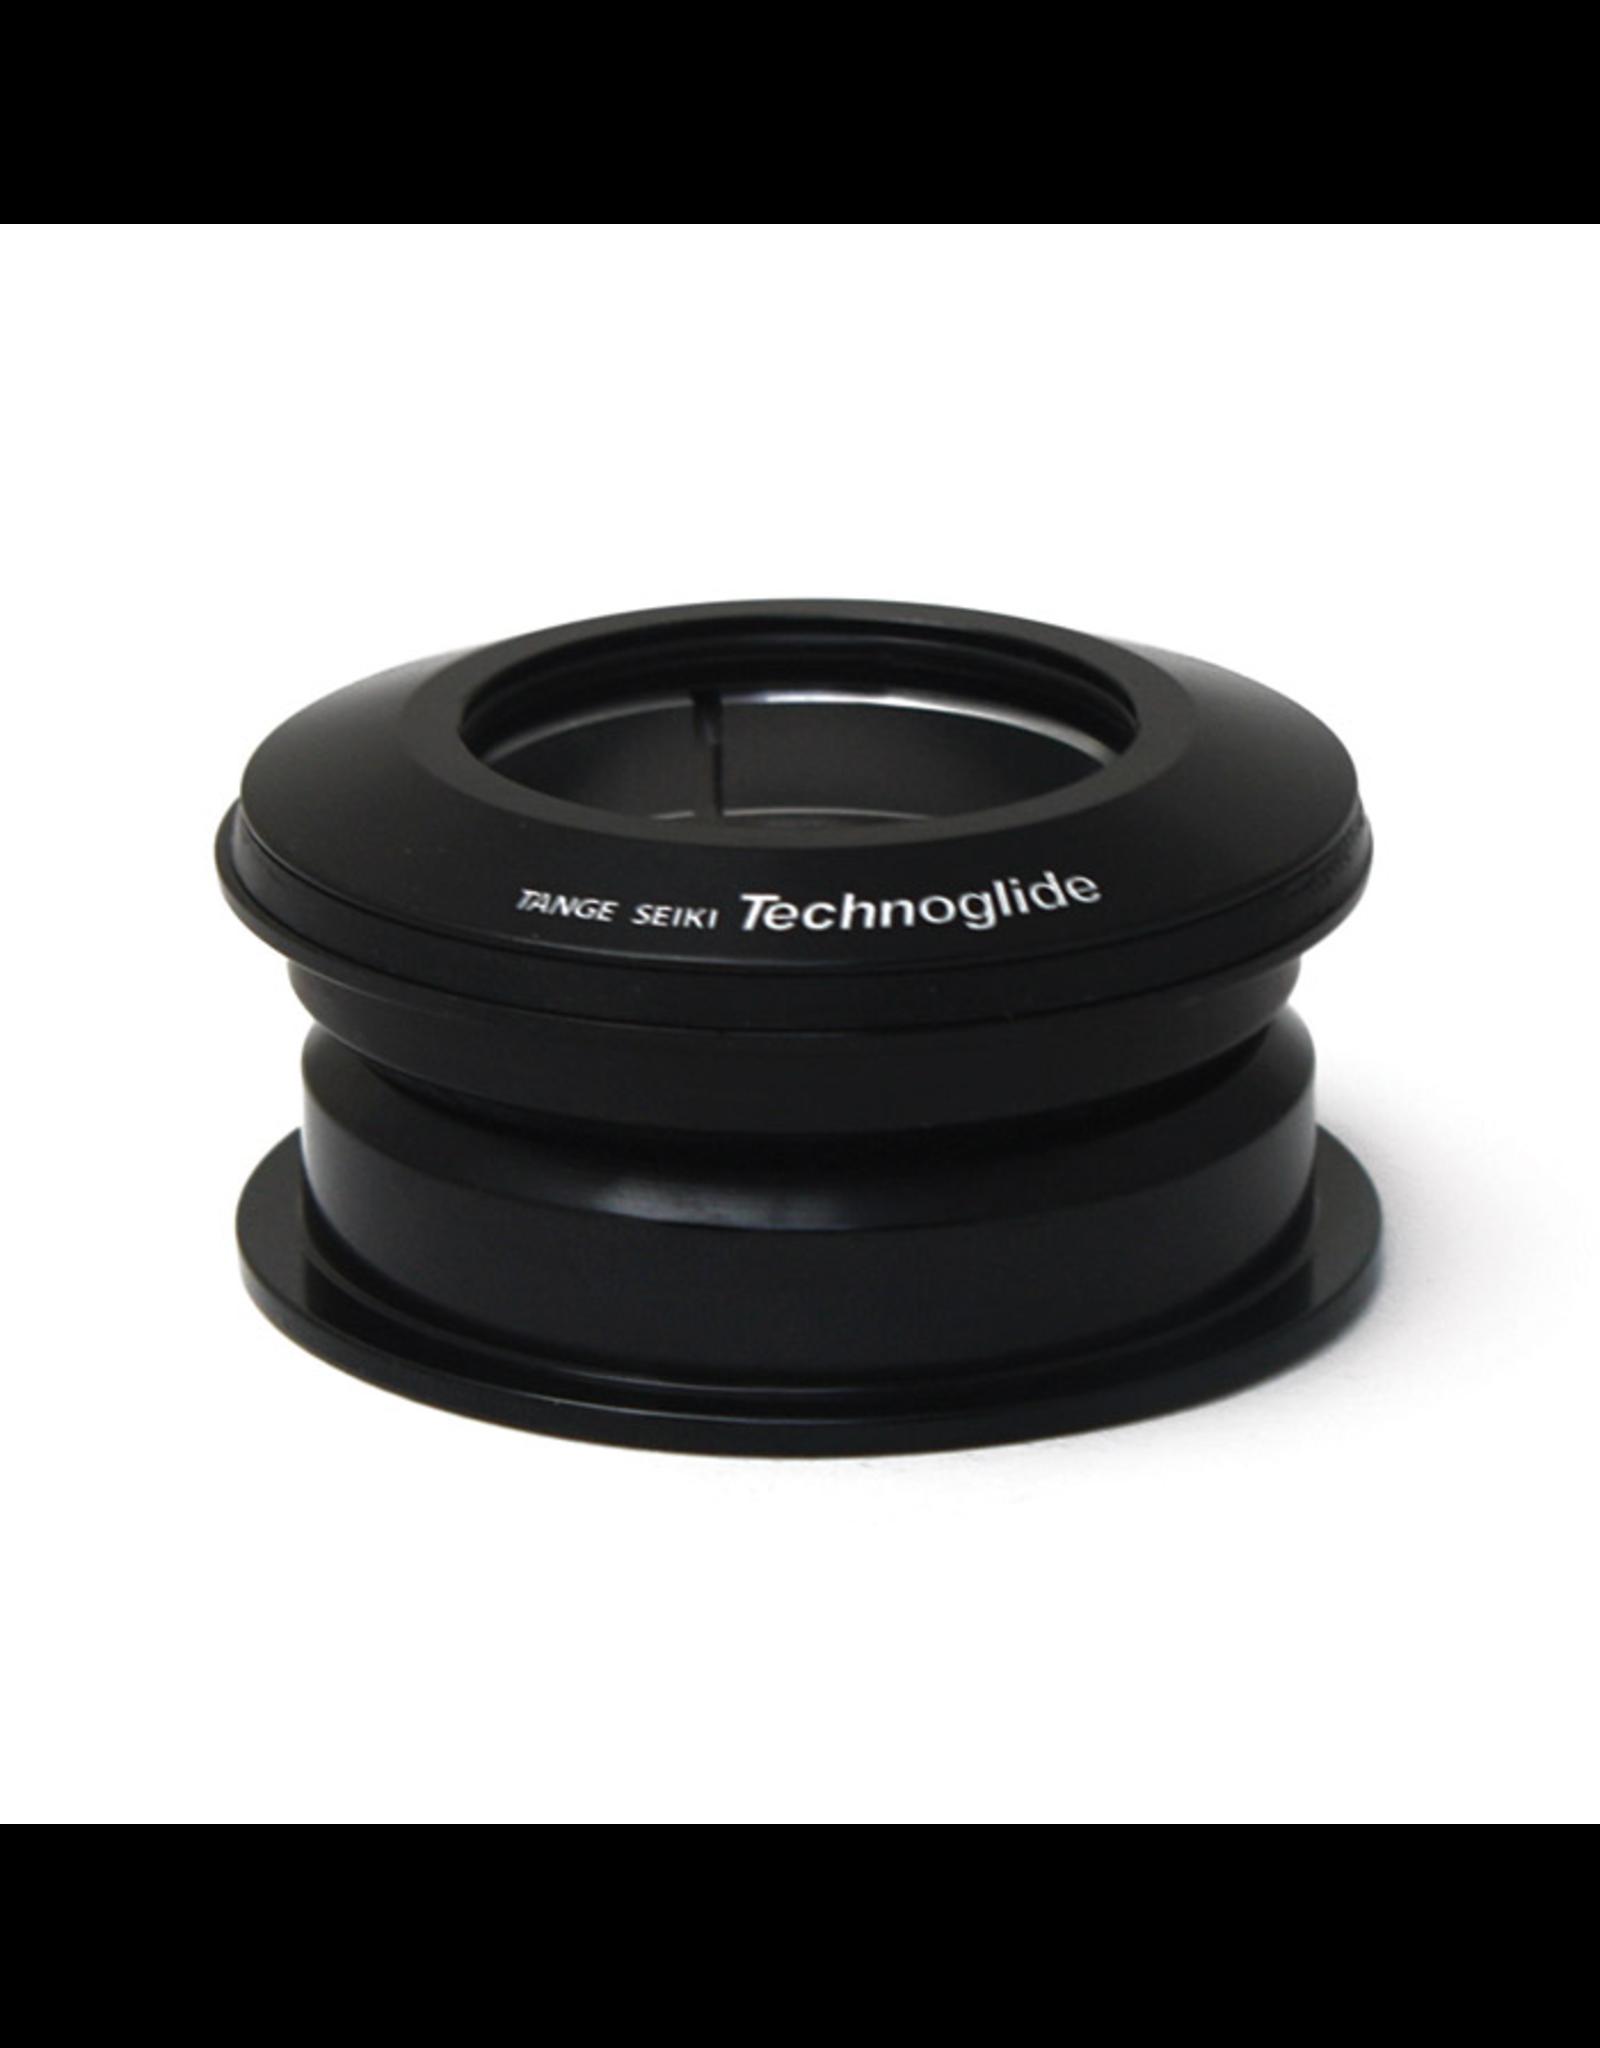 "TANGE HEADSET TANGE TECHNOGLIDE ZS22 1-1/8"" BLACK 44mm"